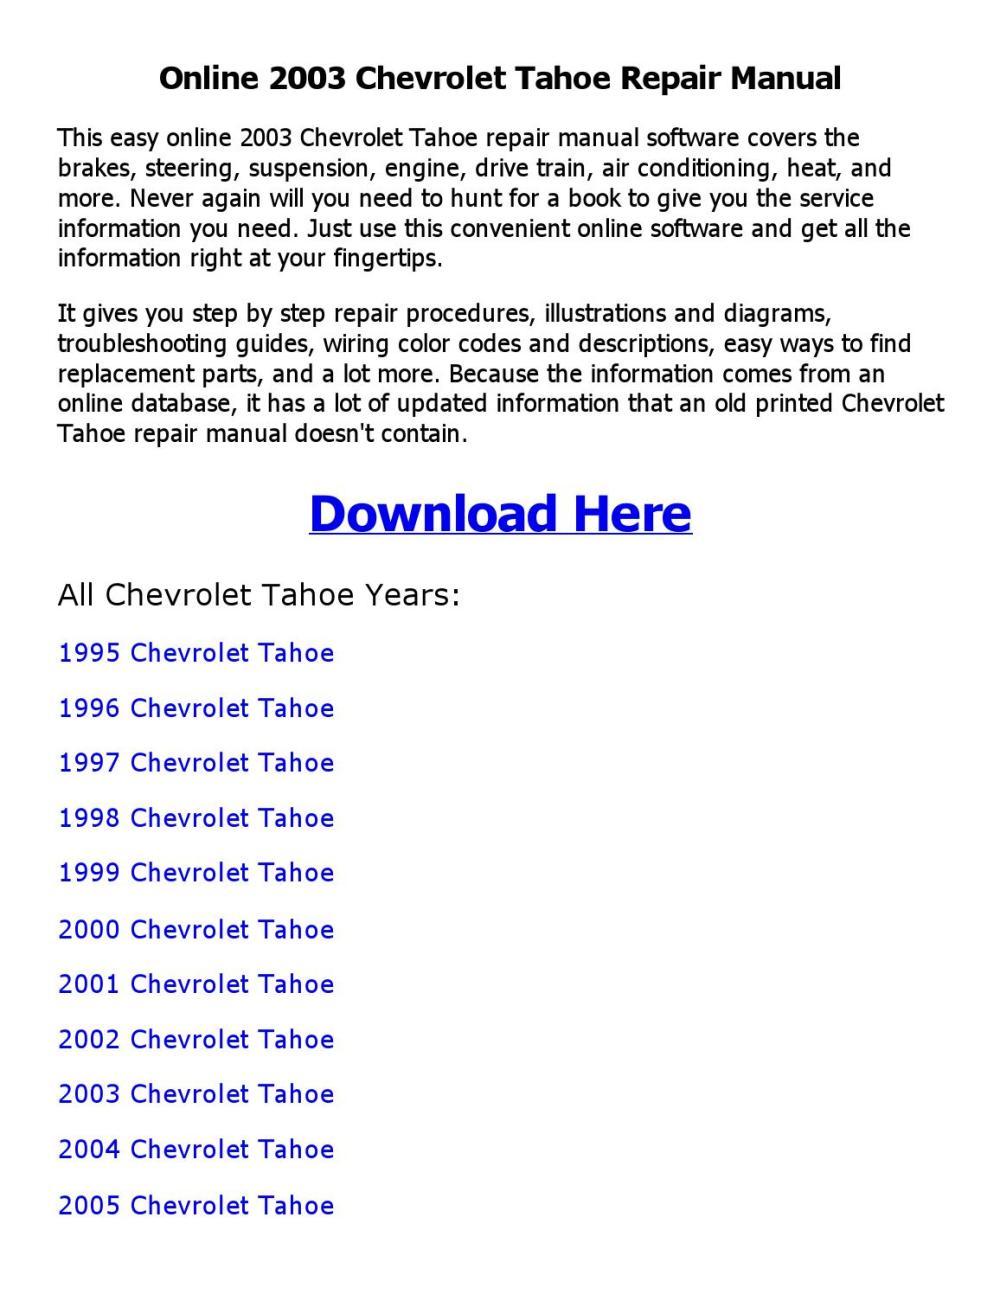 medium resolution of 2003 chevrolet tahoe repair manual online